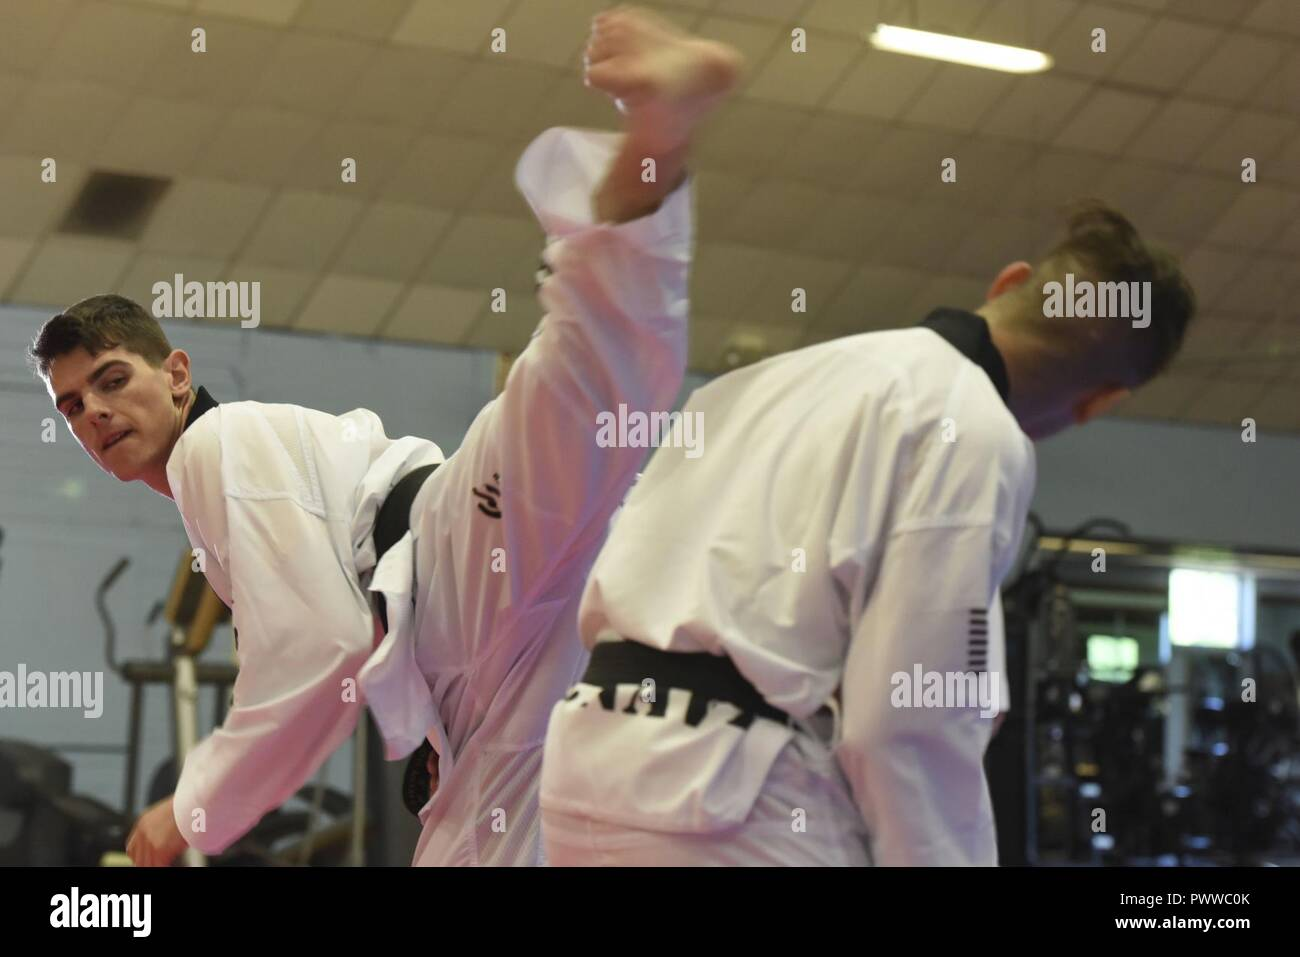 Axe Kick Stock Photos & Axe Kick Stock Images - Alamy